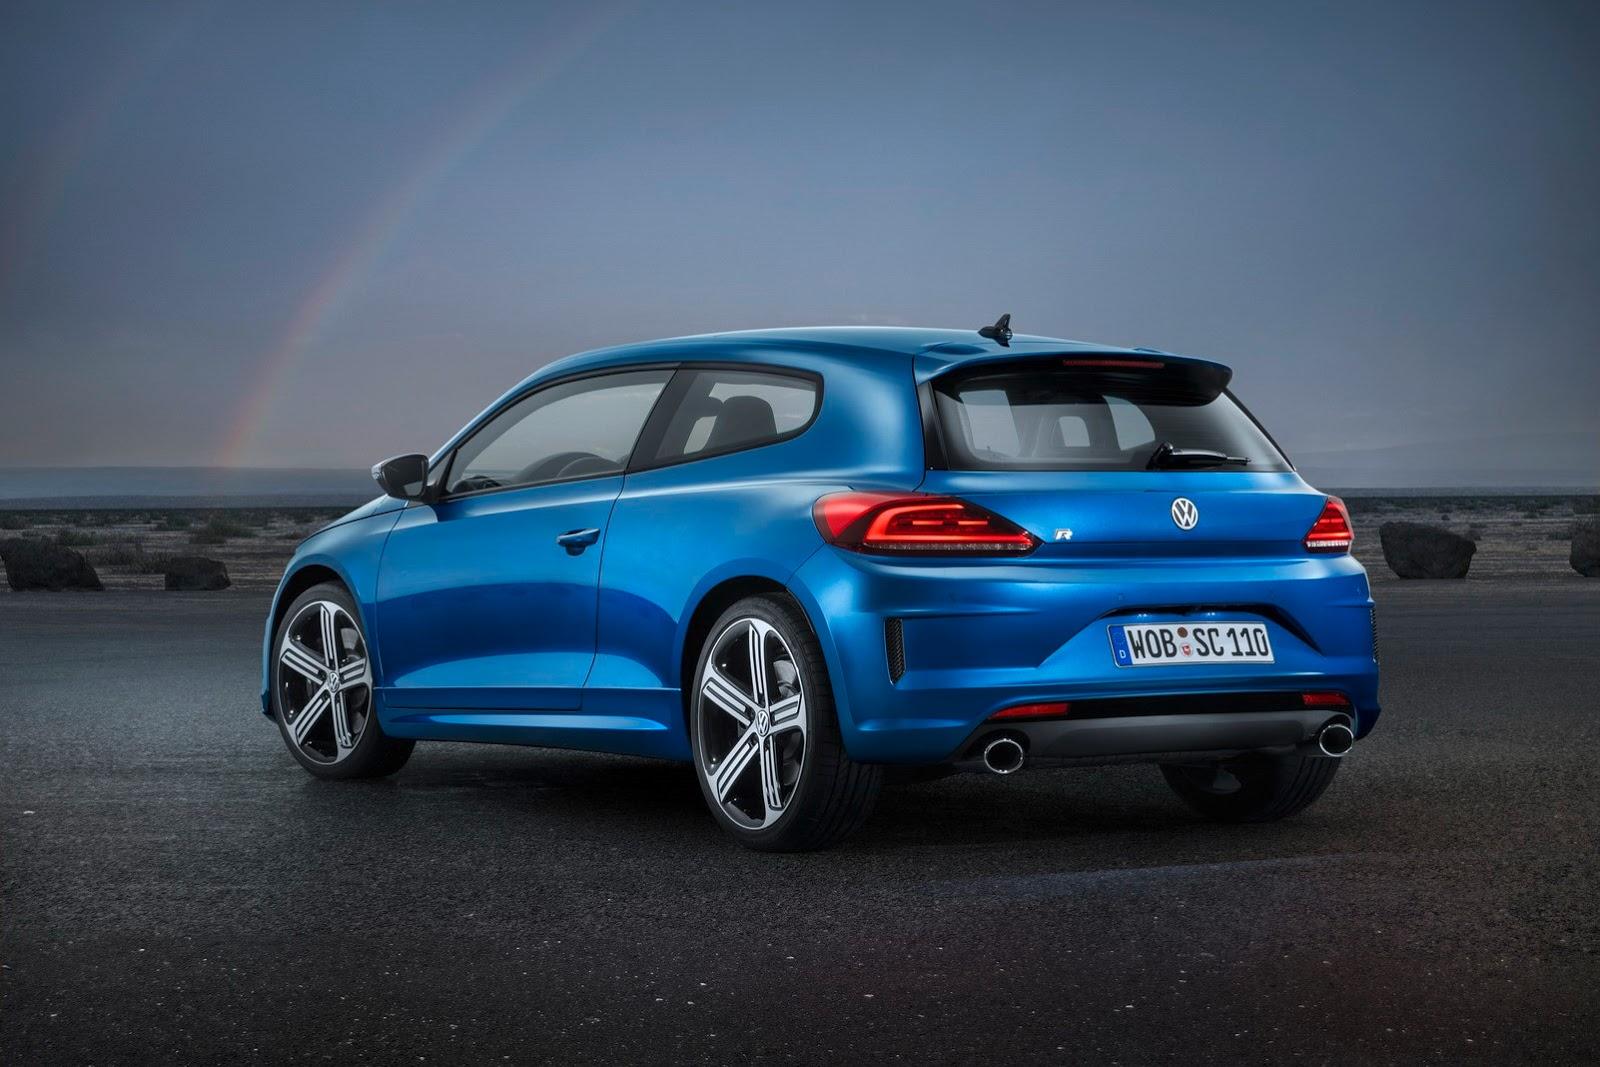 VW Scirocco R Gets 280 HP 2.0 TSI Engine - autoevolution